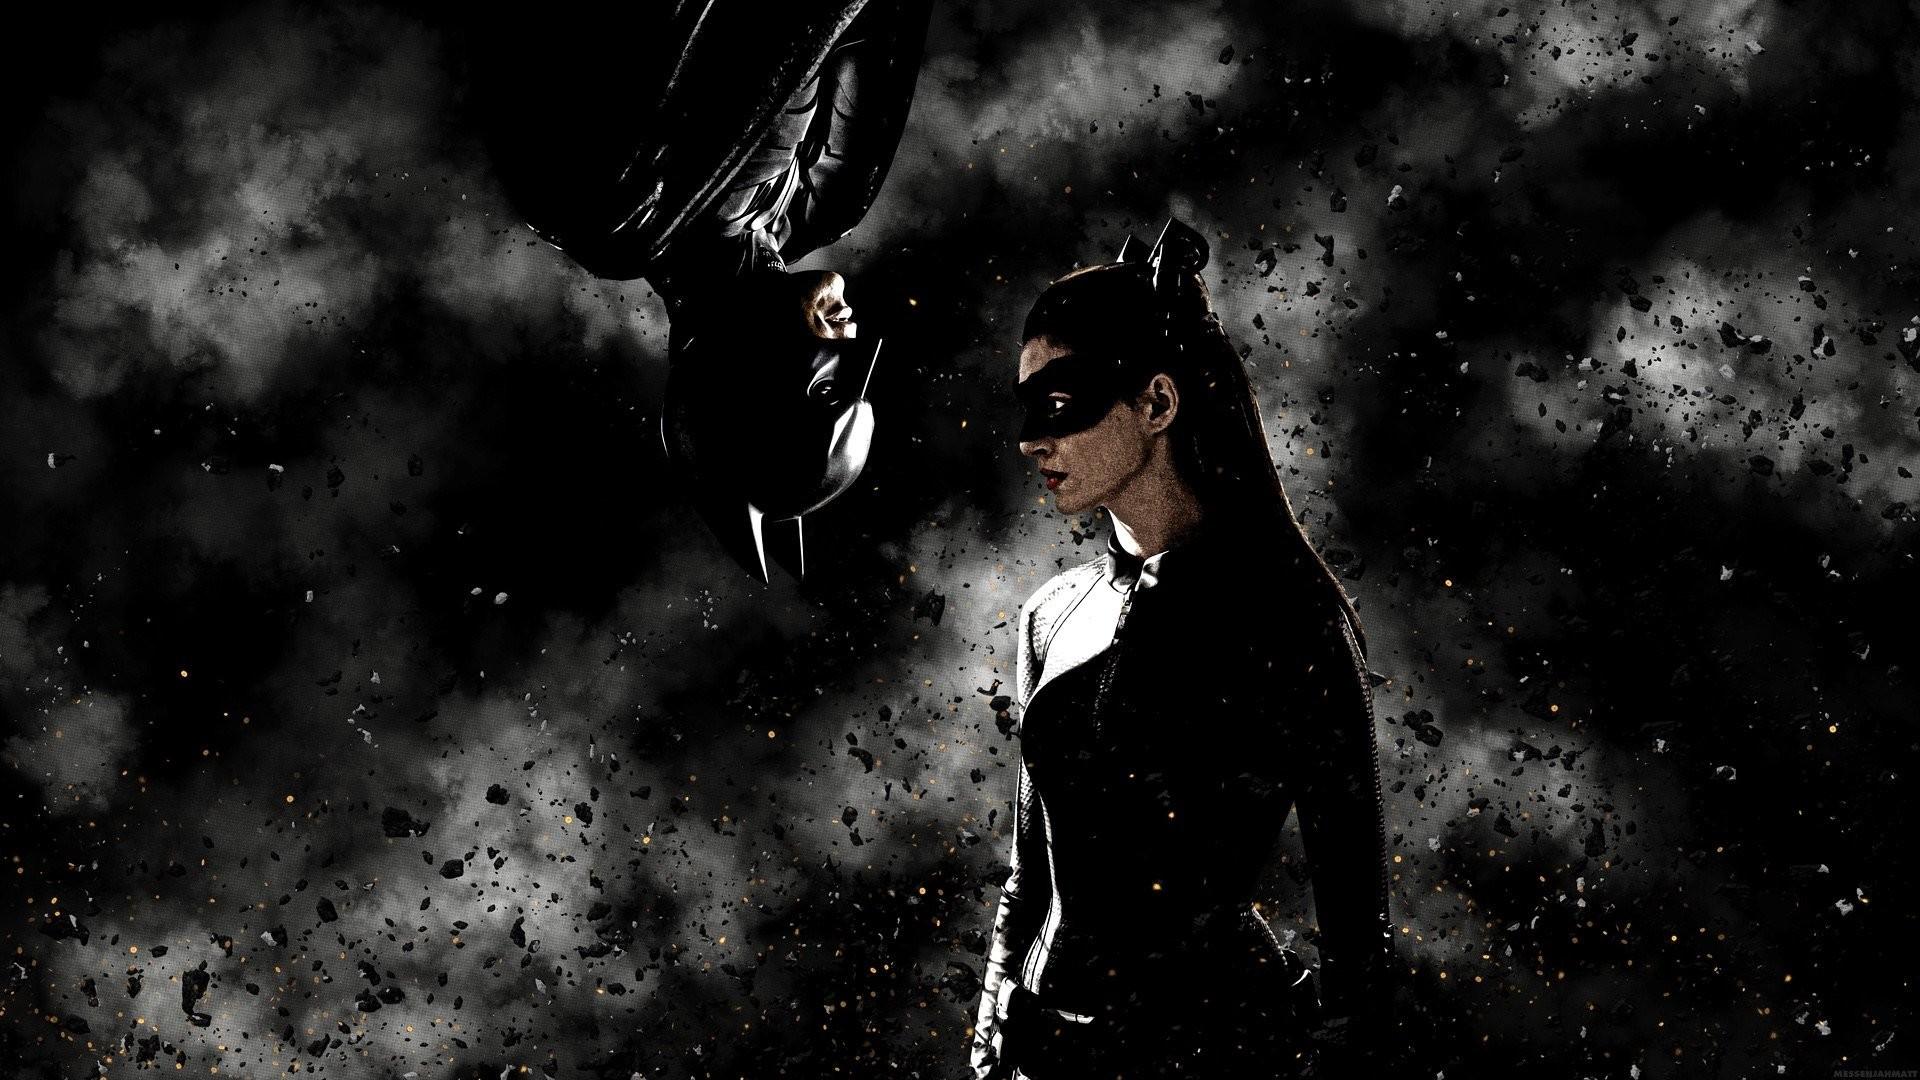 Best 25+ Dark knight wallpaper ideas on Pinterest   Batman comic wallpaper,  Batman and Batman art